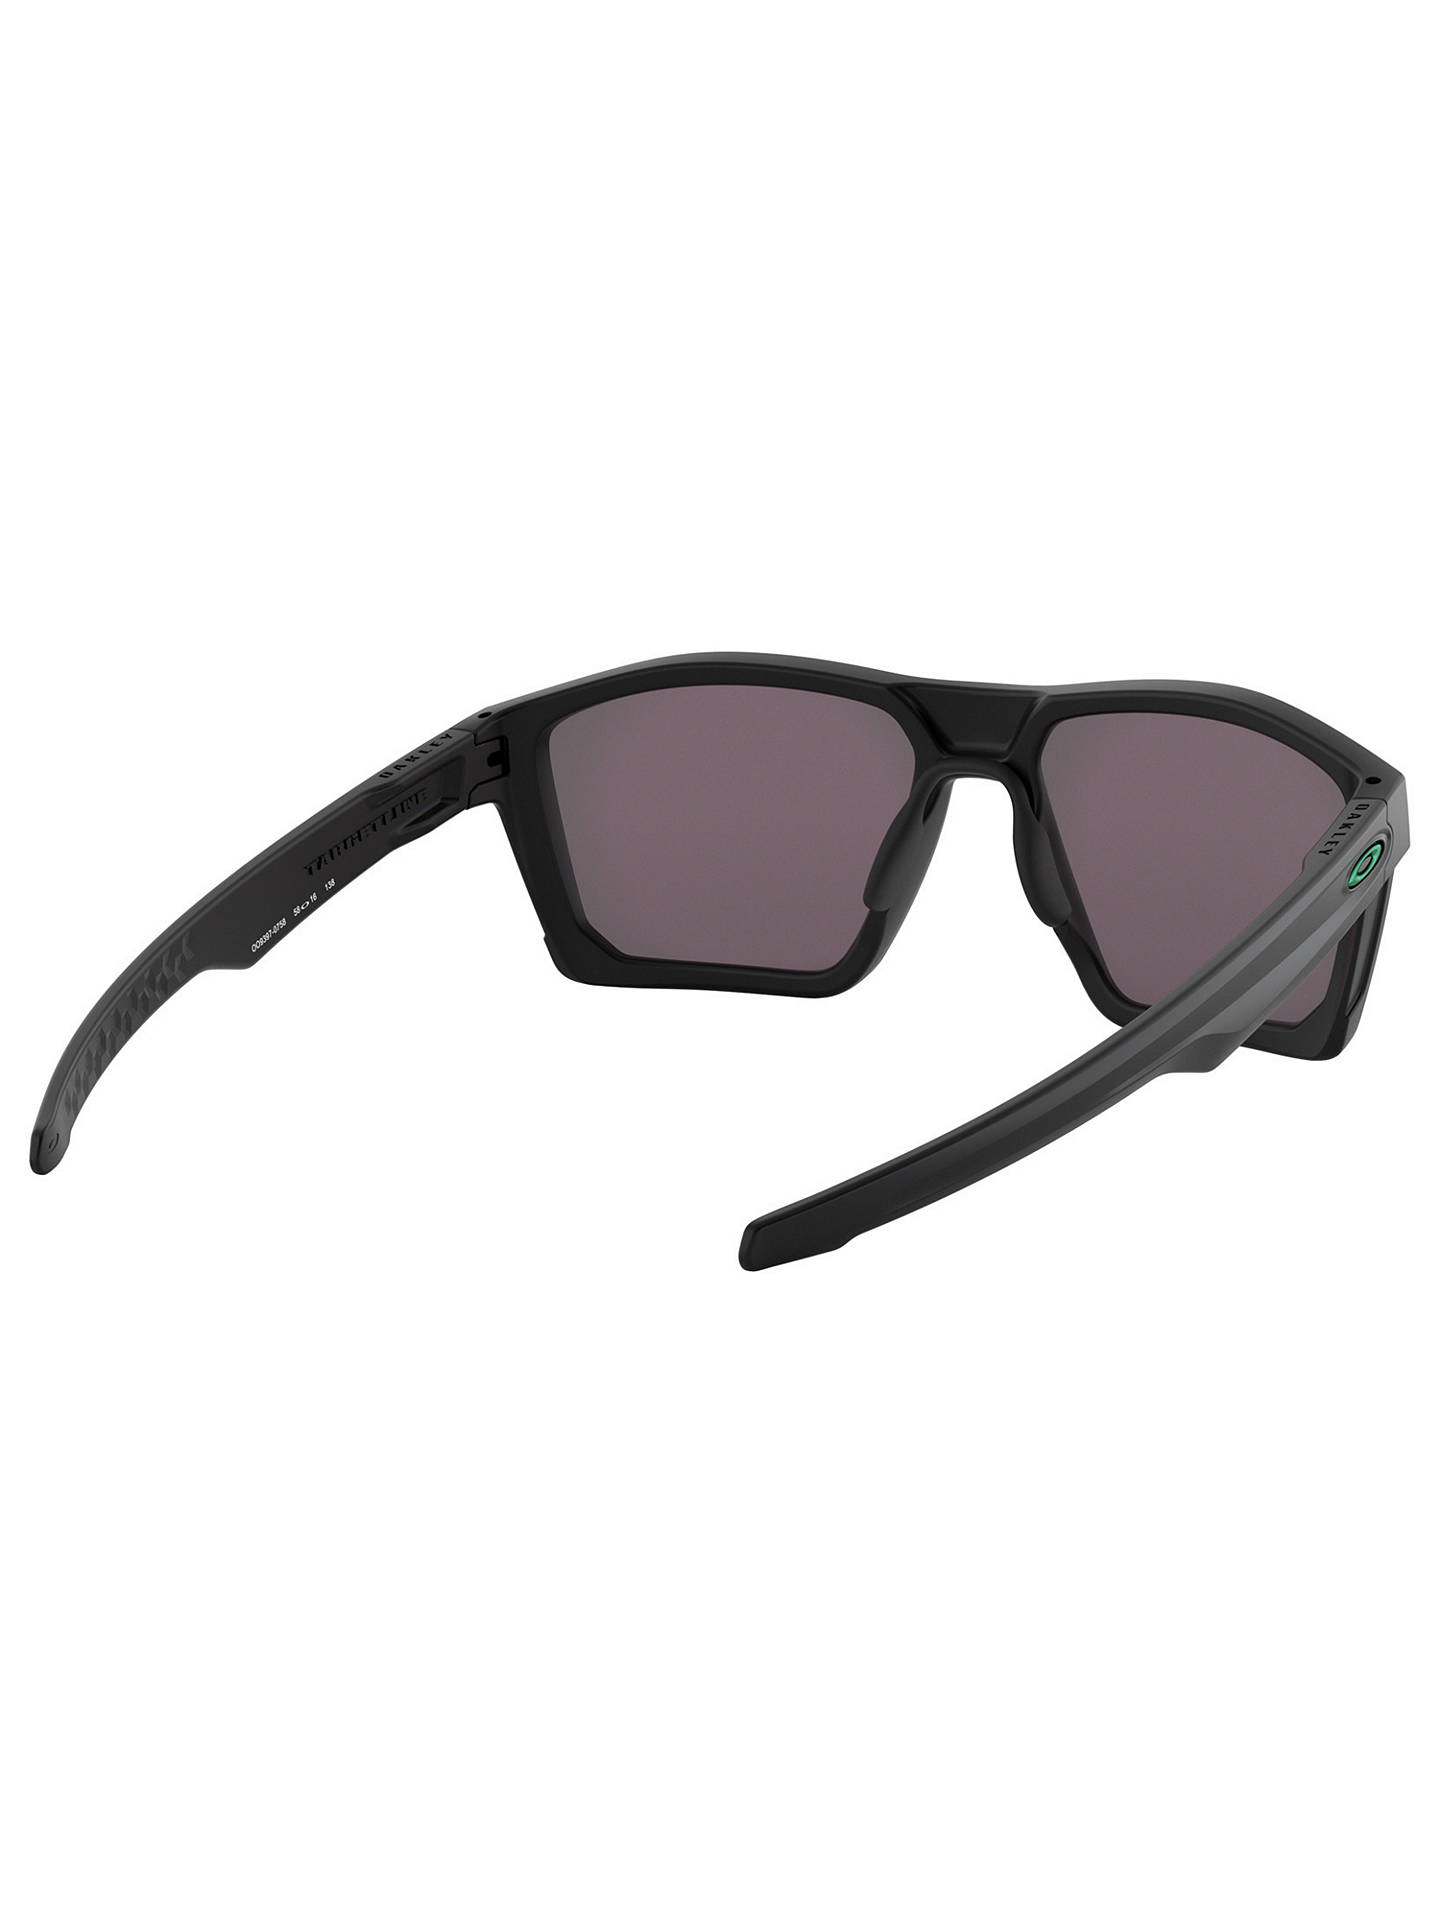 5a05bd6b0c new zealand buyoakley oo9397 mens targetline prizm polarised square  sunglasses black green online at johnlewis.